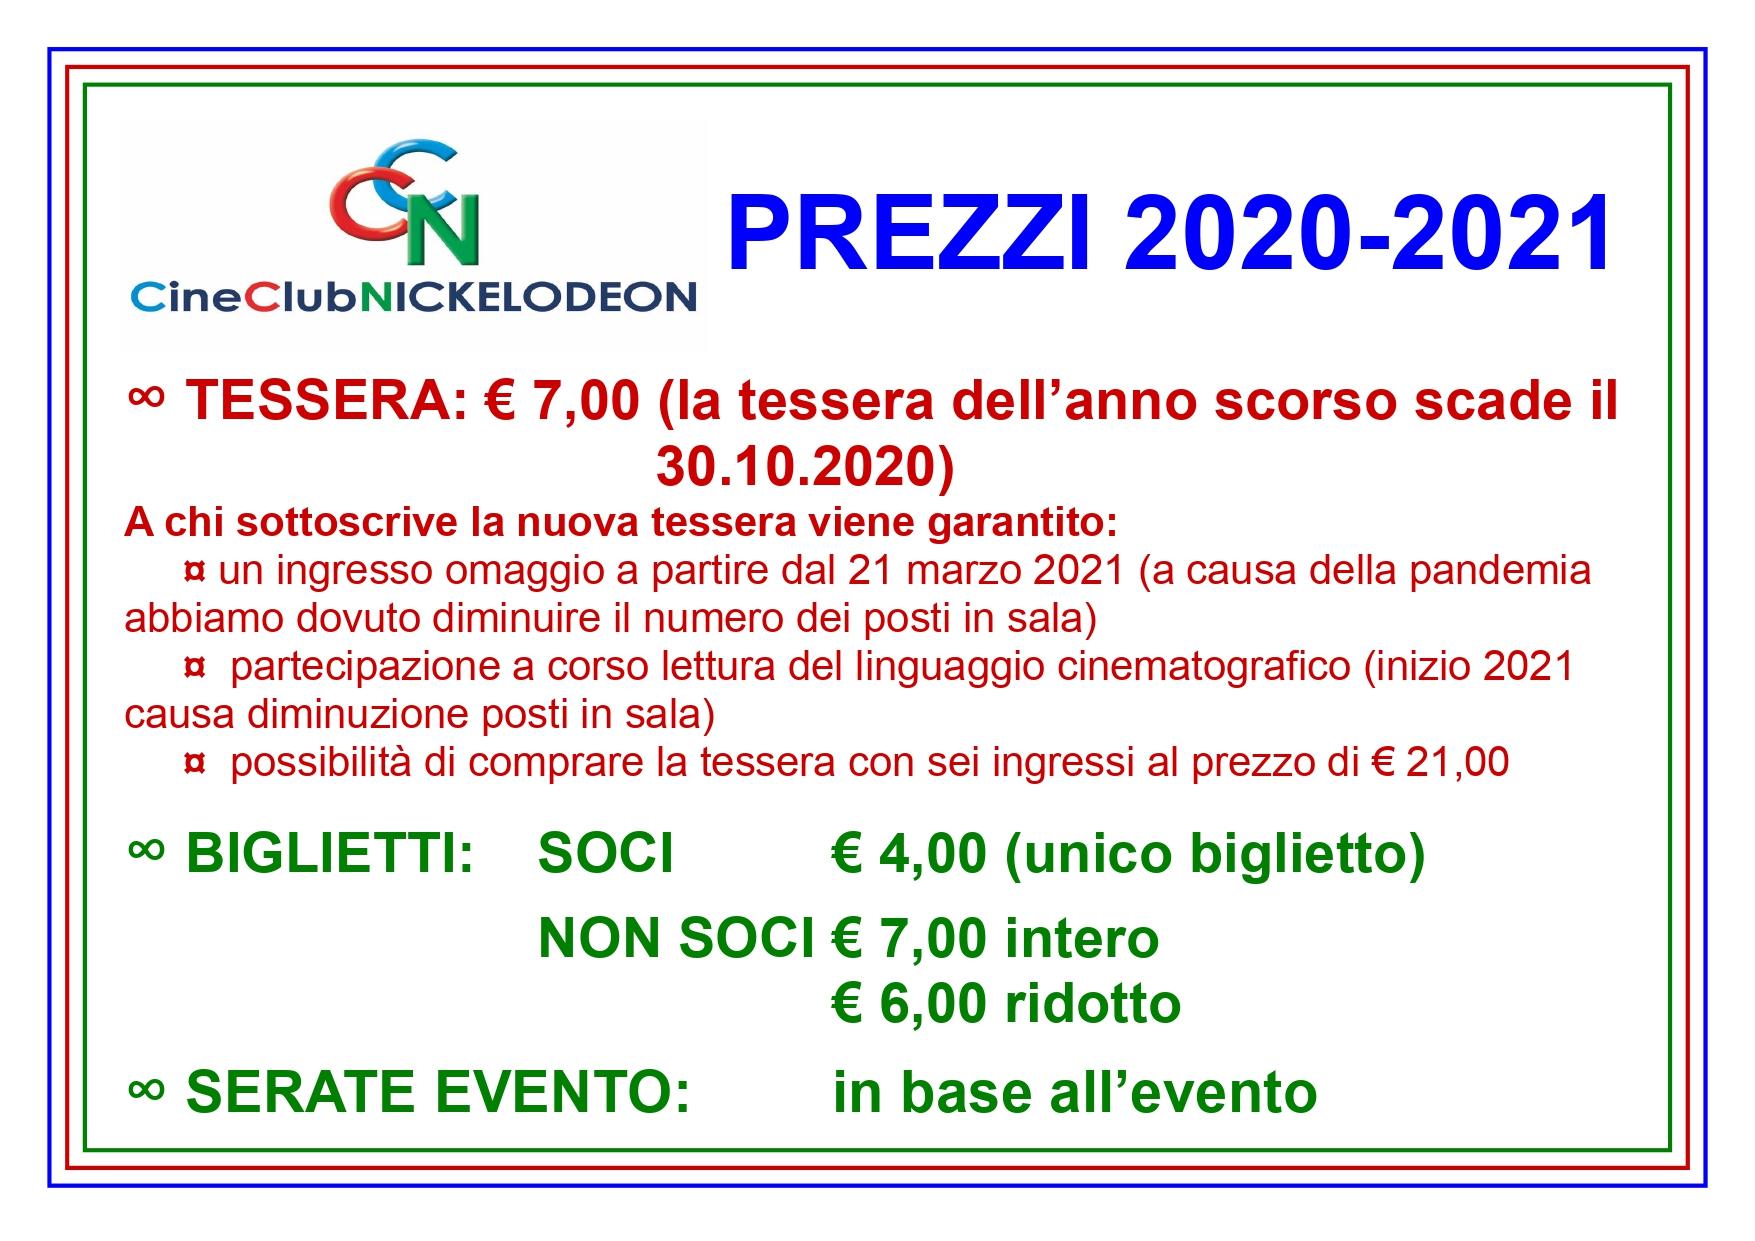 LISTINO CINECLUB NICKELODEON 2020/2021